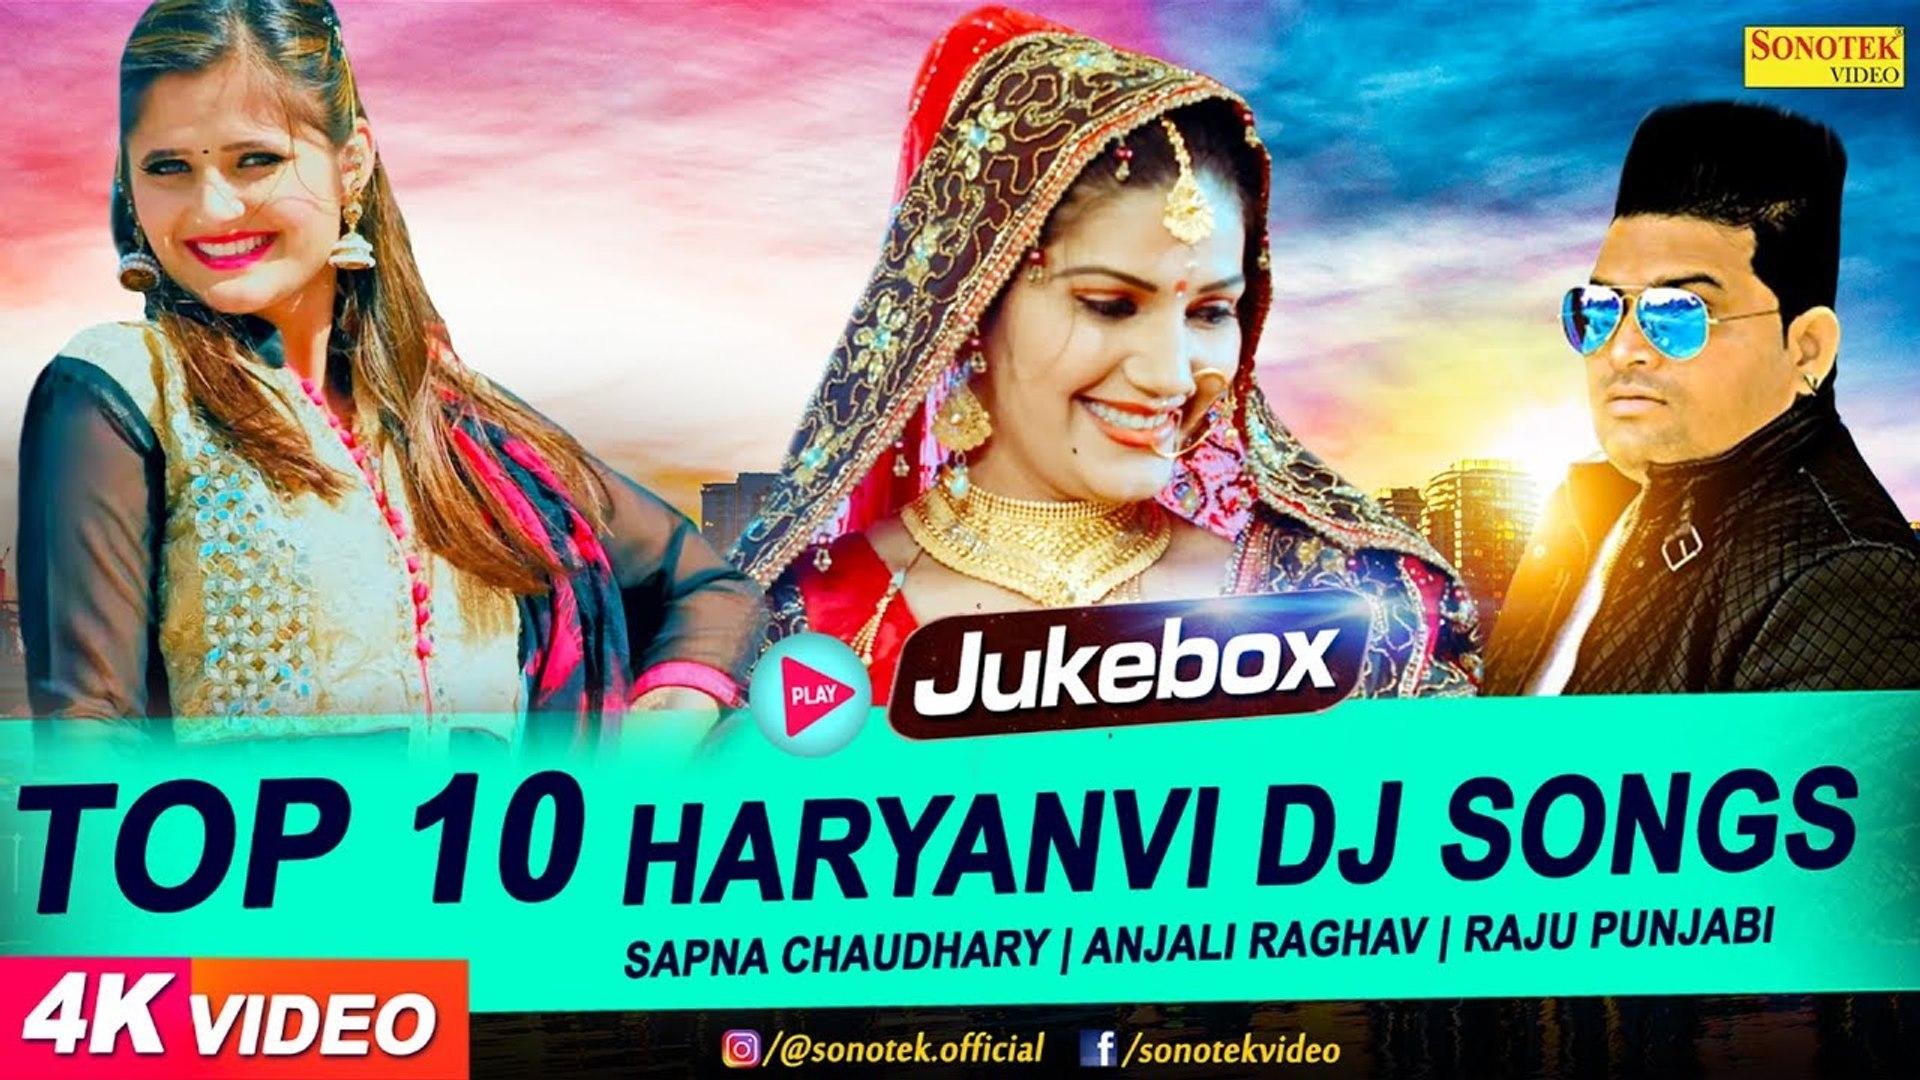 Top 10 Haryanvi Dj Song 2018 _ Sapna Chaudhary _ Raju Punjabi _ Latest  Haryanvi Songs Haryanavi 2018 - YouTube (720p)